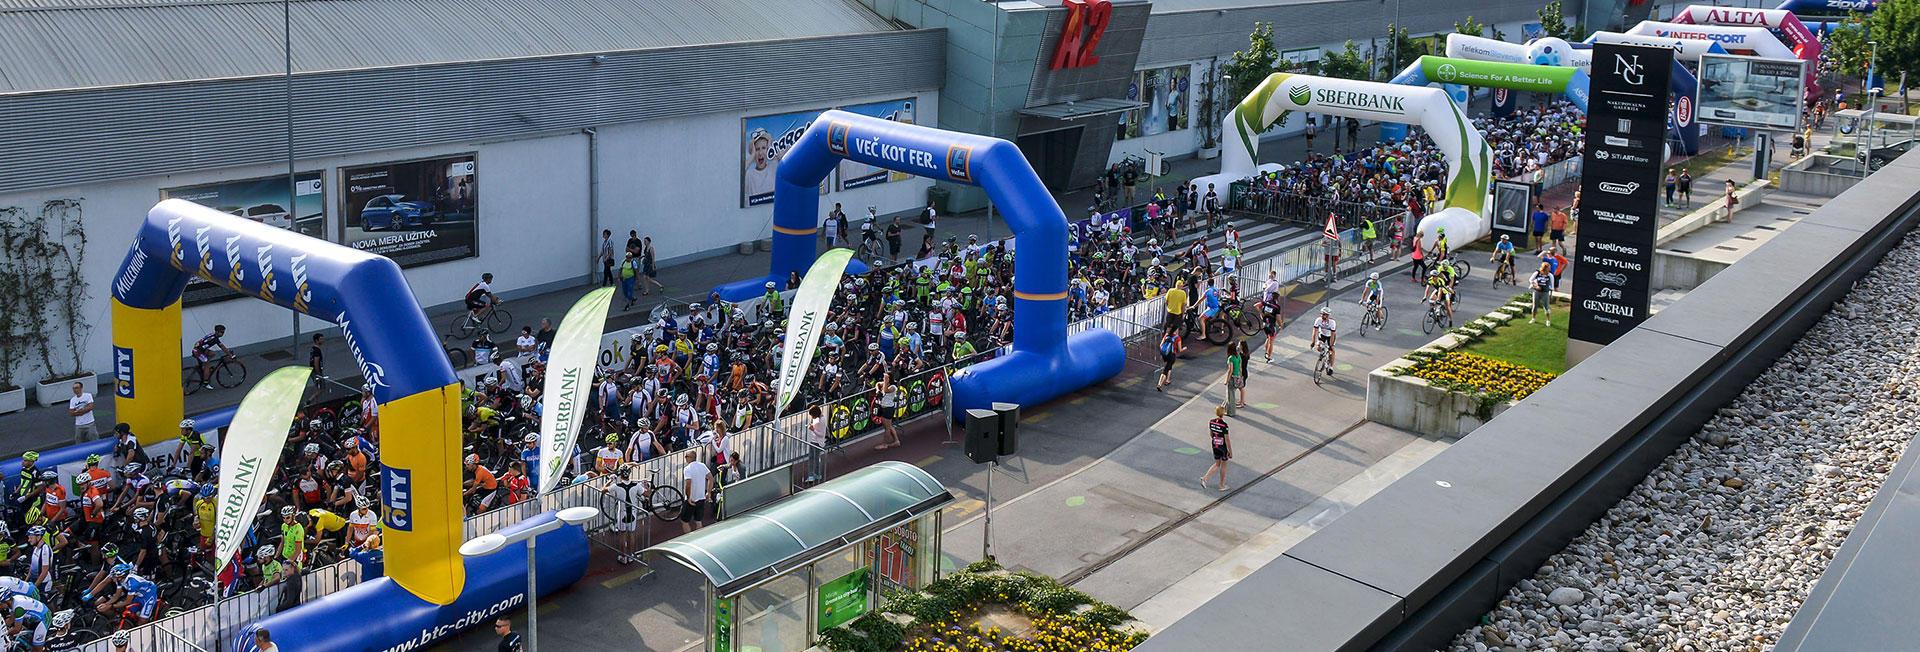 Marathon Franja BTC City 2016 10.-12. June 2016